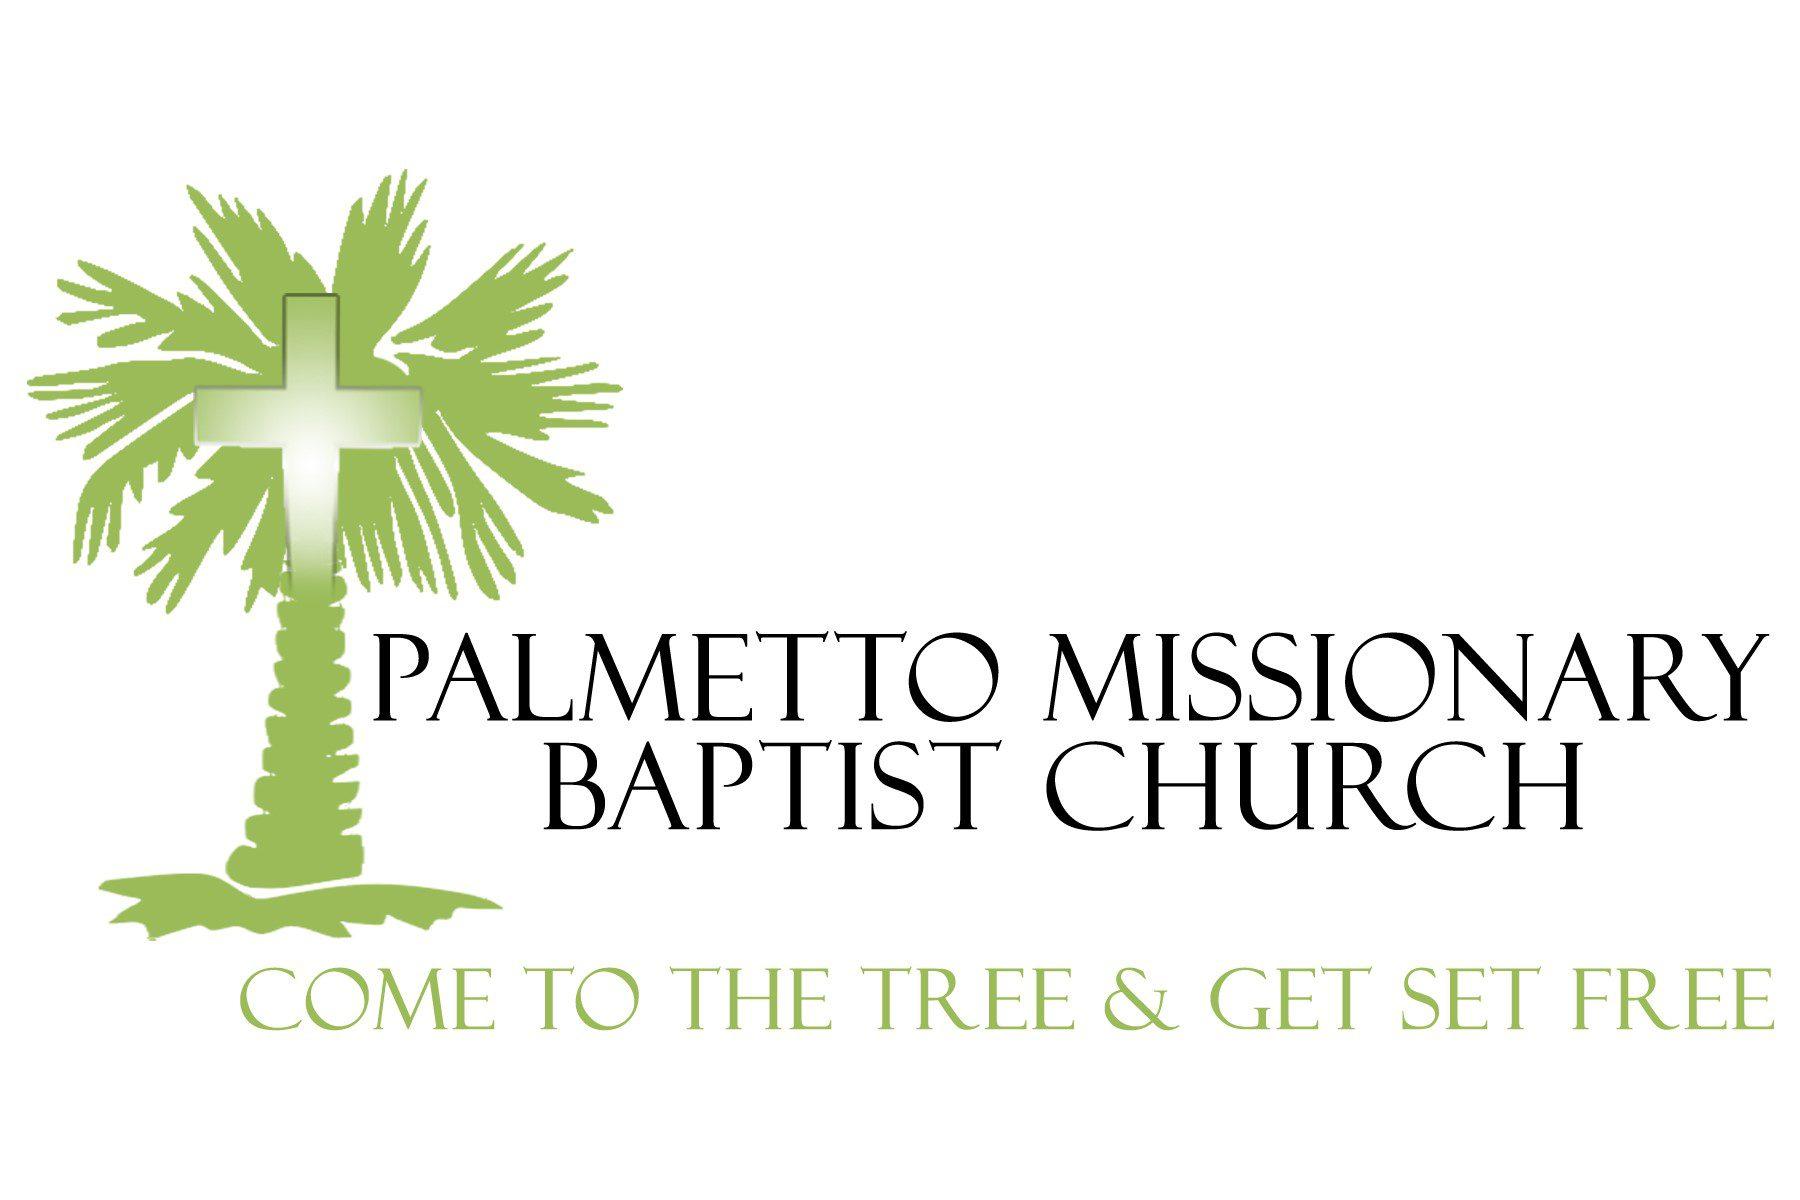 Palmetto Missionary Baptist Church